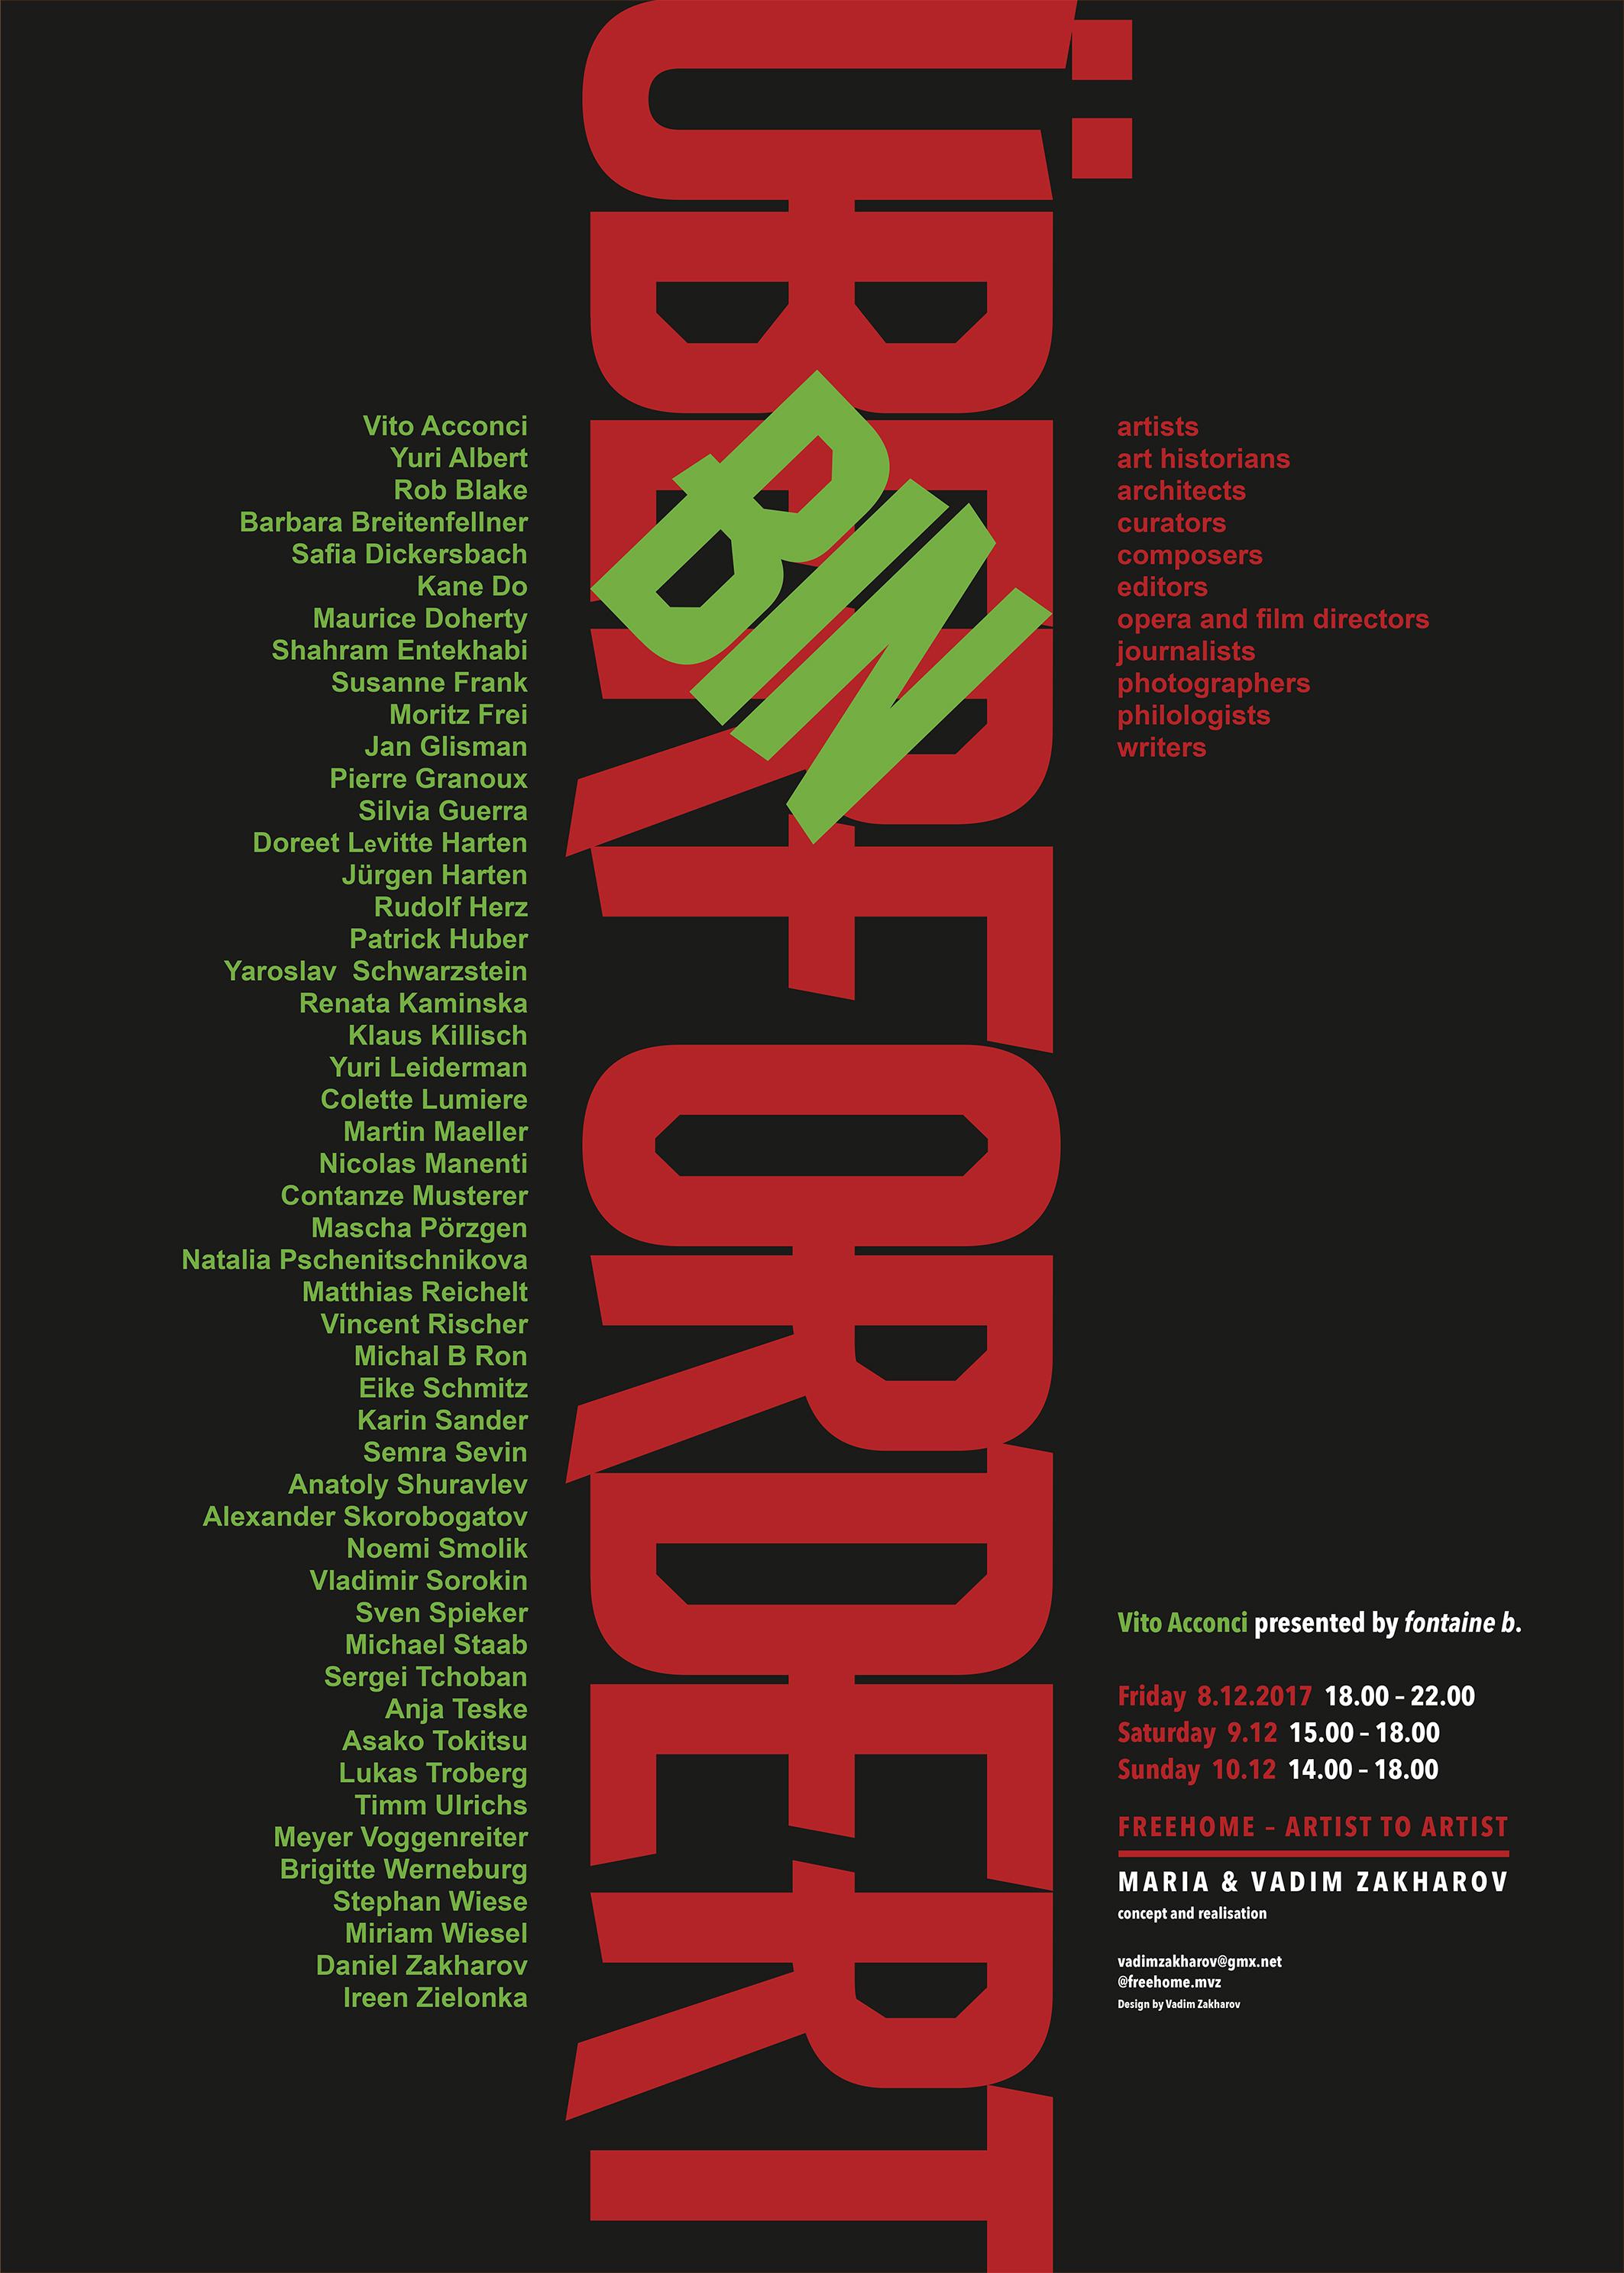 Ausstellung bei Vadim Zakharov, Freehome